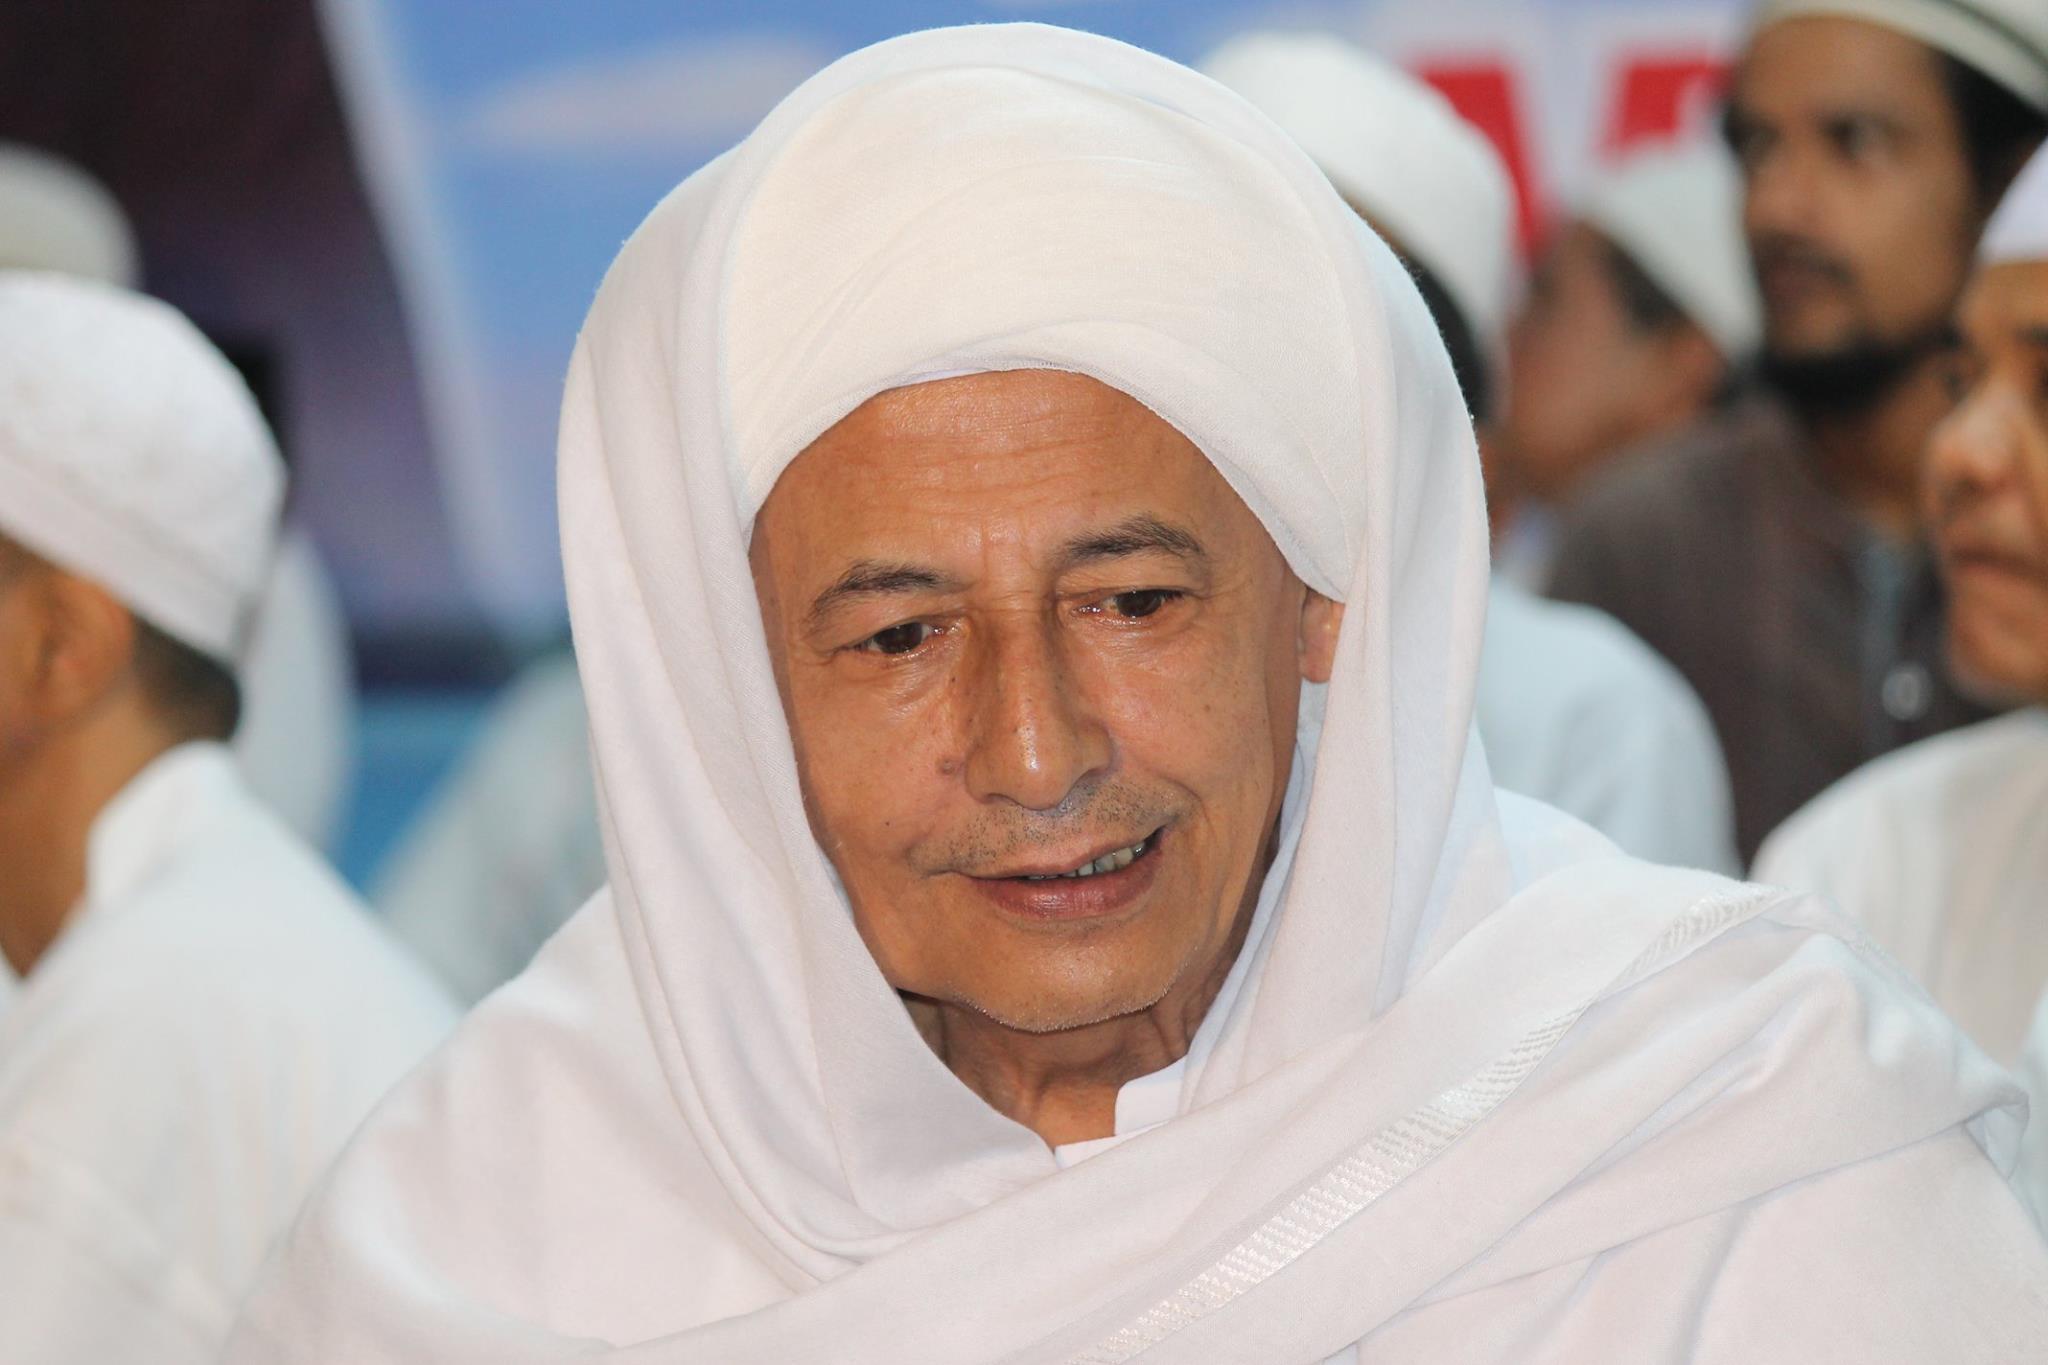 Habib Luthfi-Hidup Menjadi Mudah Apabila Ikhlas-IslamRamah.co